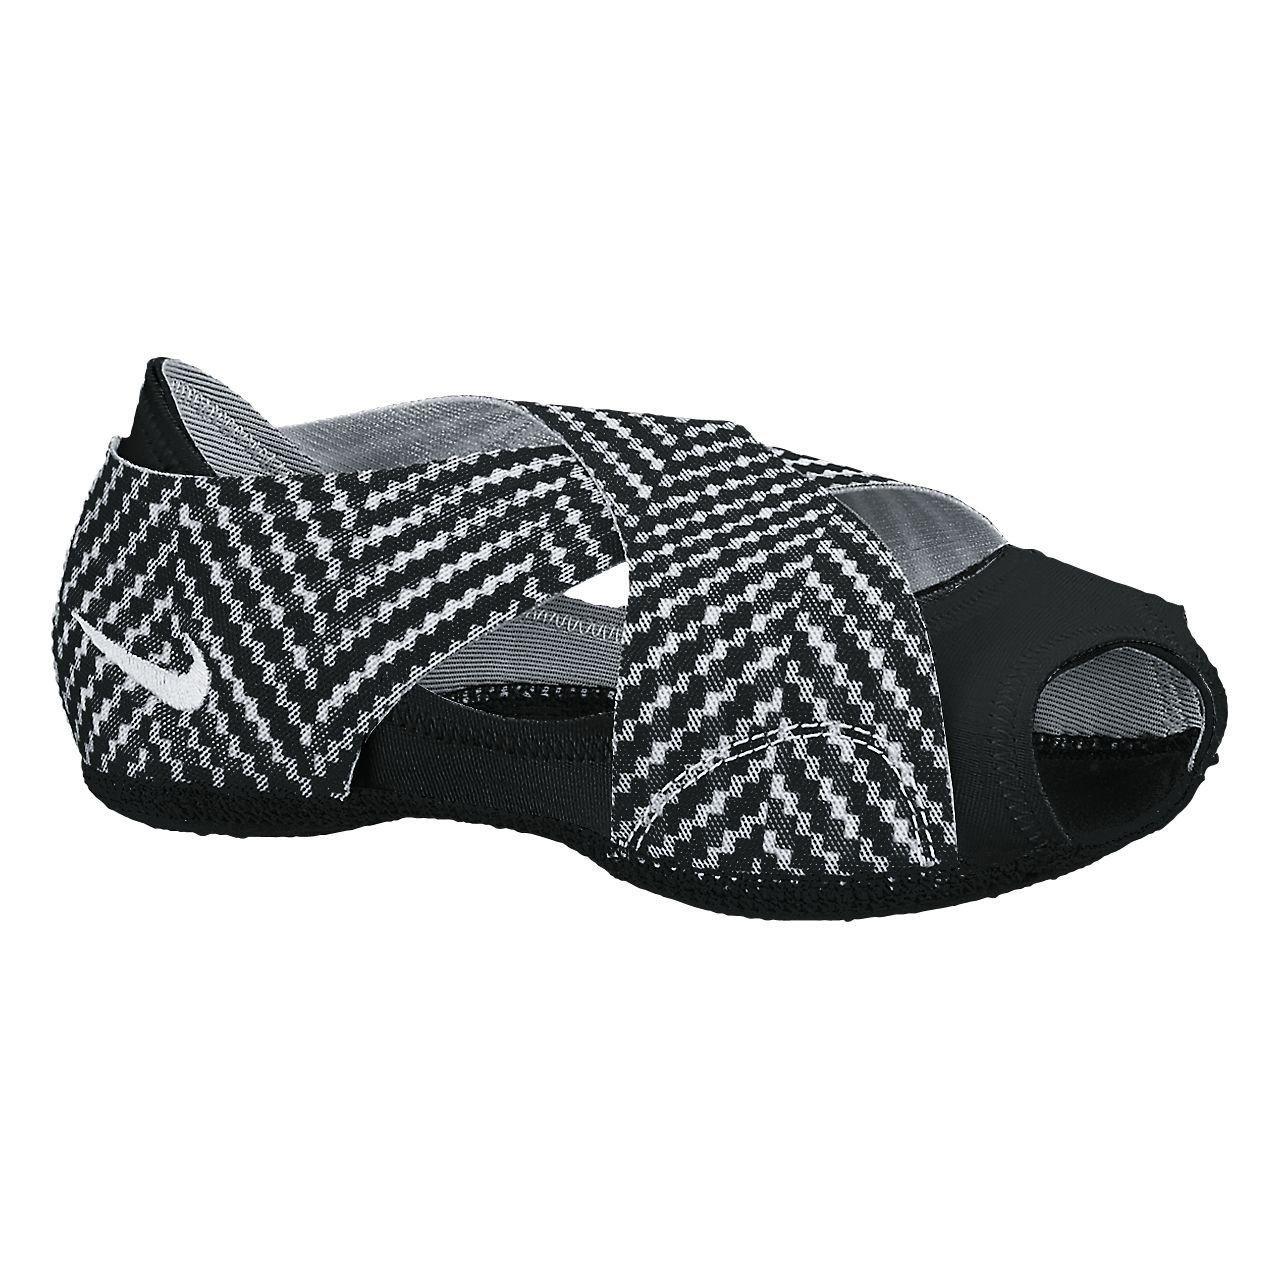 Amazon.com: Nike Studio Wrap Ballet Yoga 2 Impresión Blanco ...